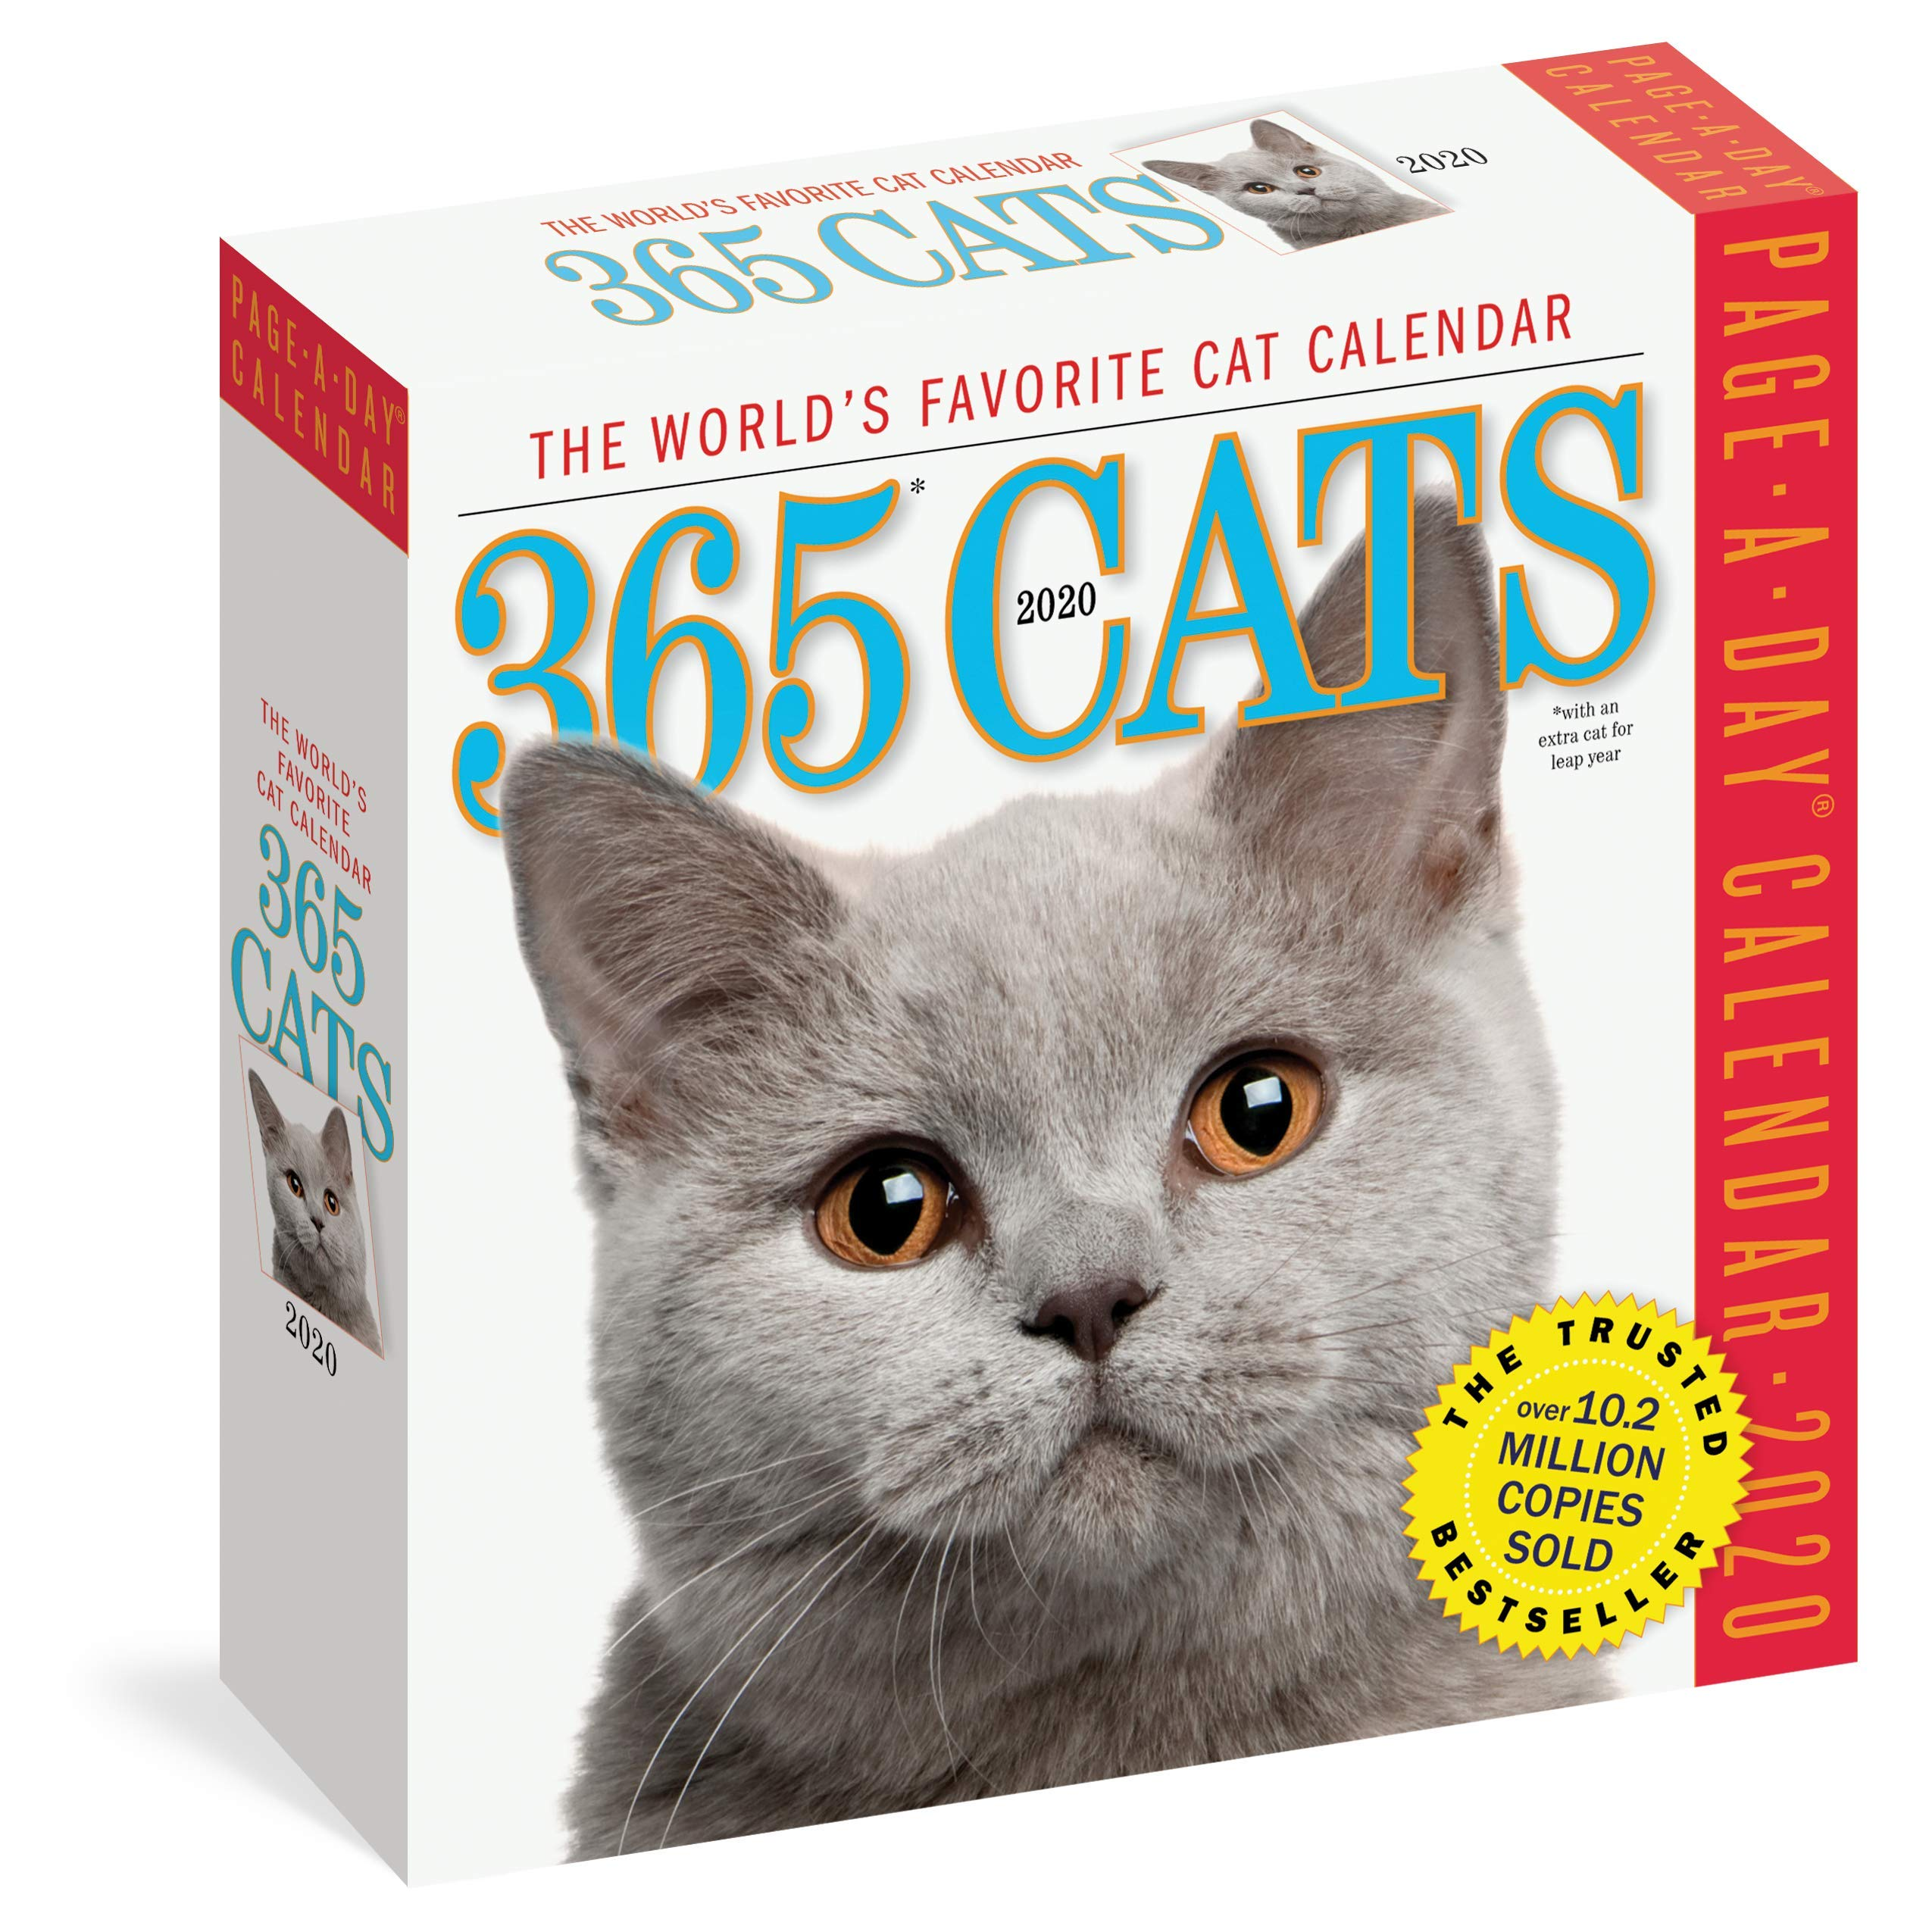 Cat Calendar 2020